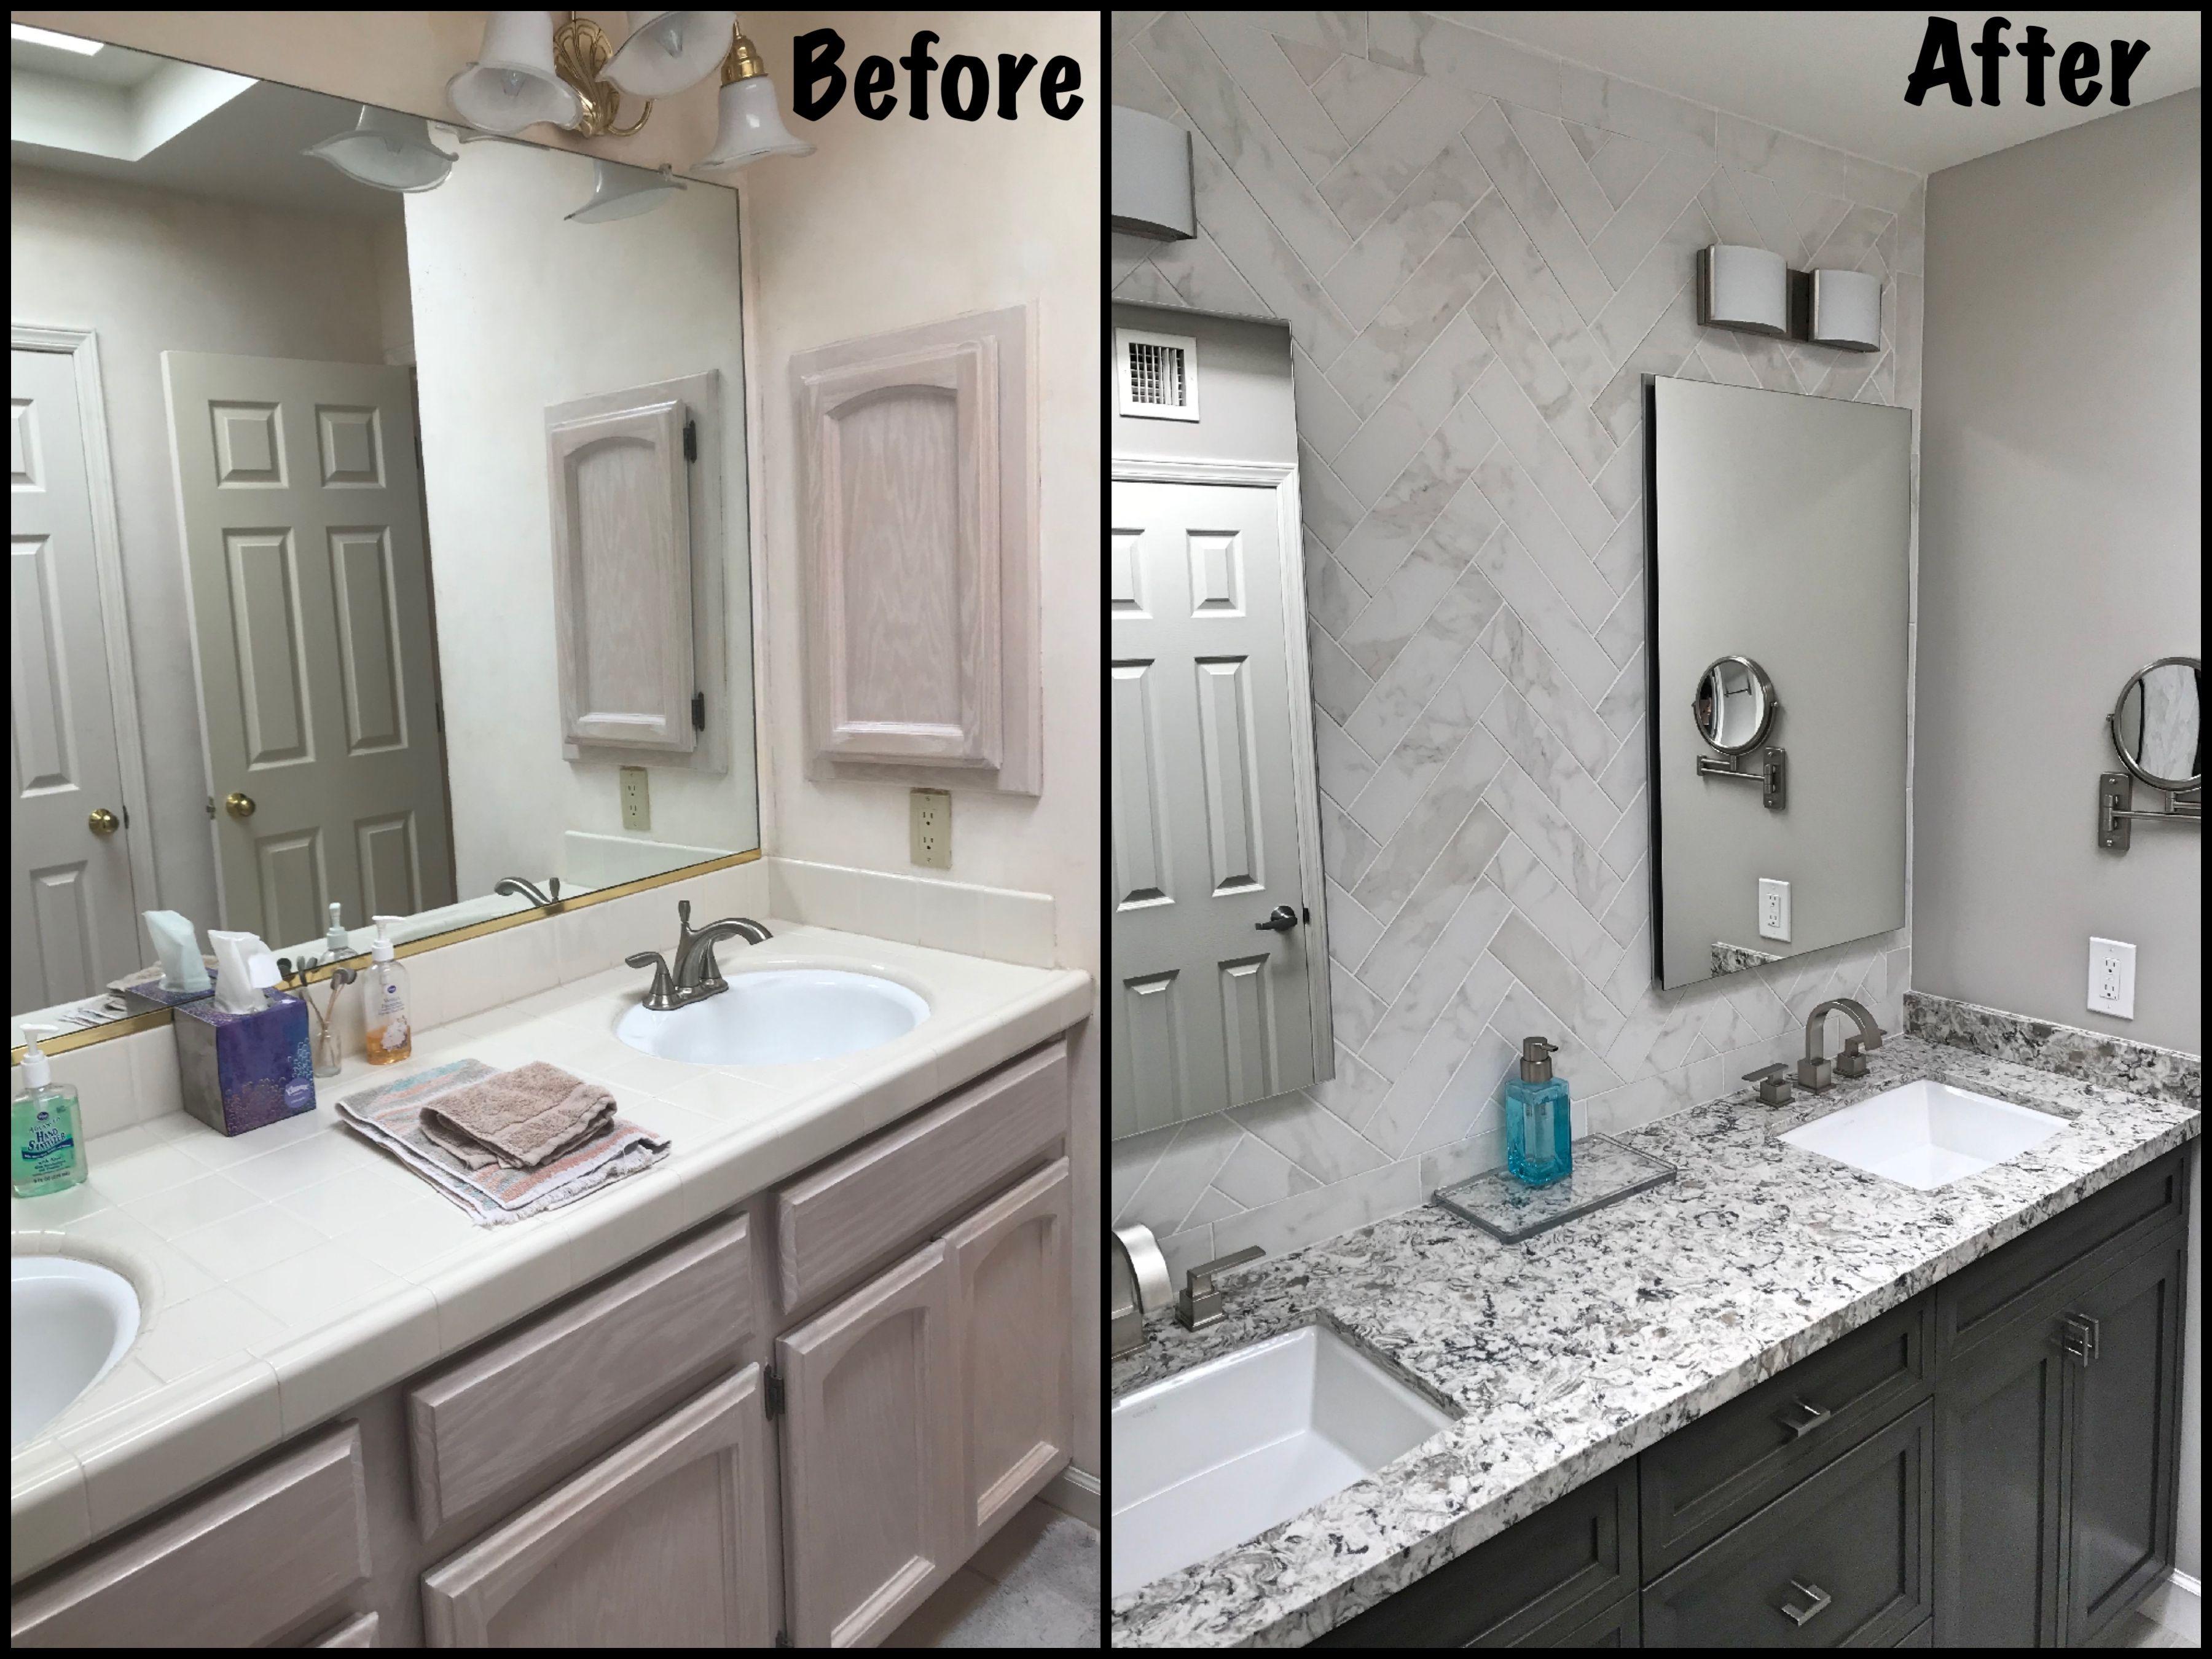 Bathroom Remodel Guest Bathroom Remodel Bathroom Remodel Small Budget Small Bathroom Remodel